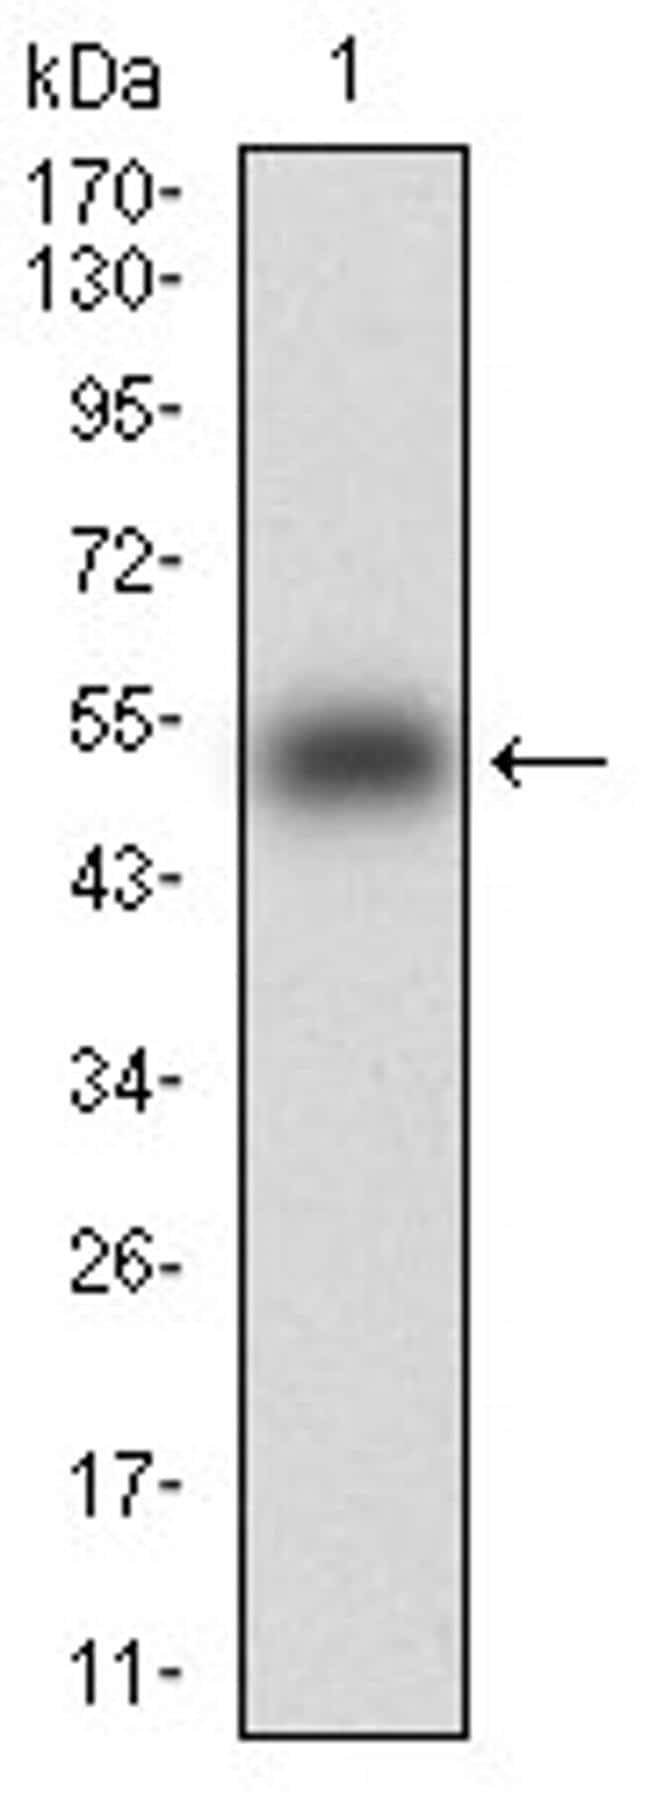 KHDRBS2 Antibody in Western Blot (WB)